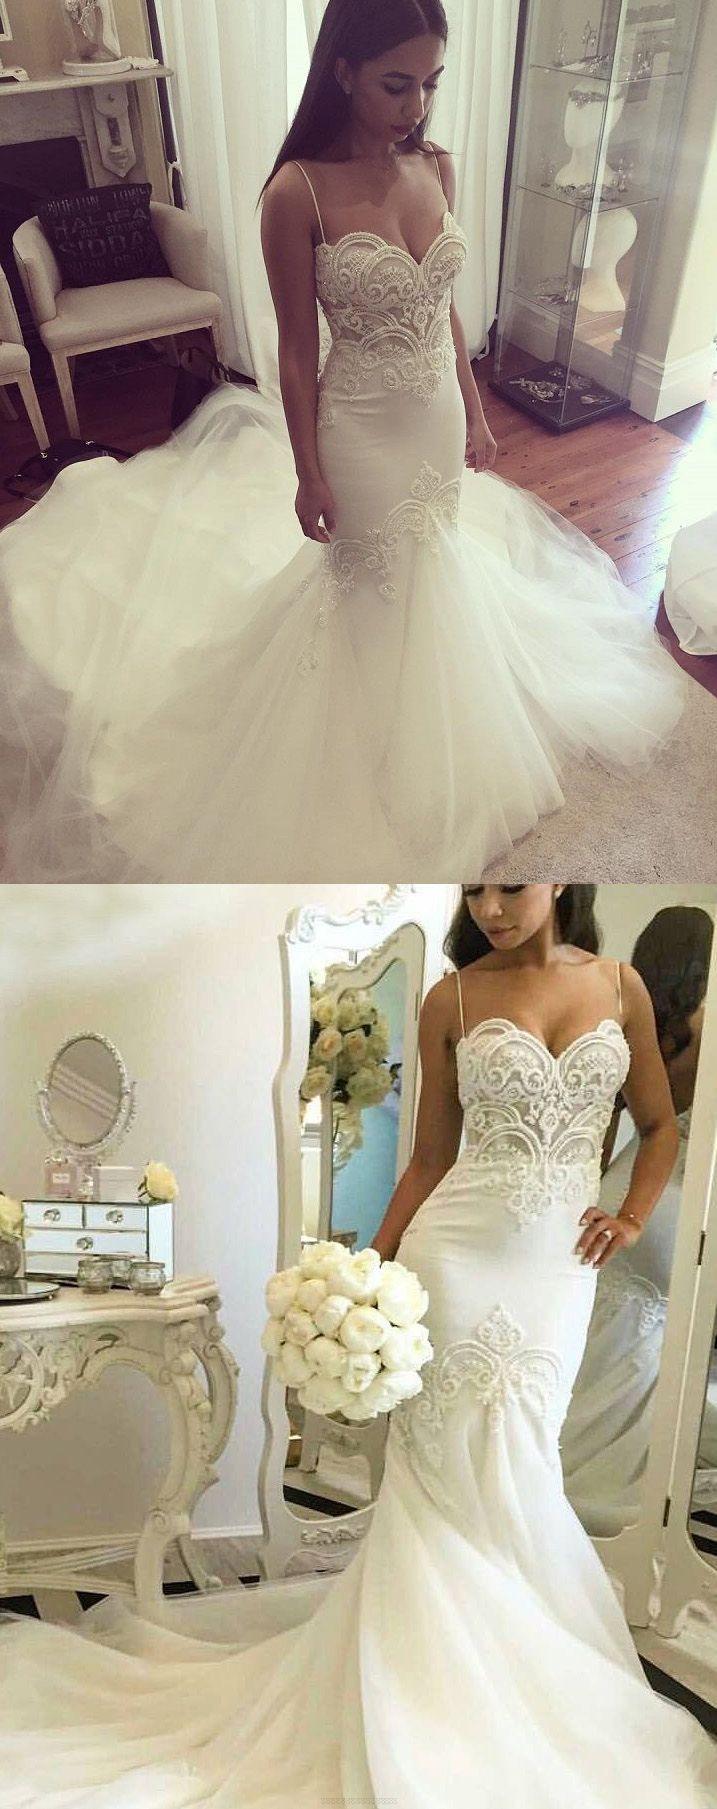 Sleeveless Wedding Dresses, White Sleeveless Wedding Dresses, Long Wedding Dresses, Sexy Wedding Dresses Trumpet/Mermaid Sweep/Brush Train Bridal Gown